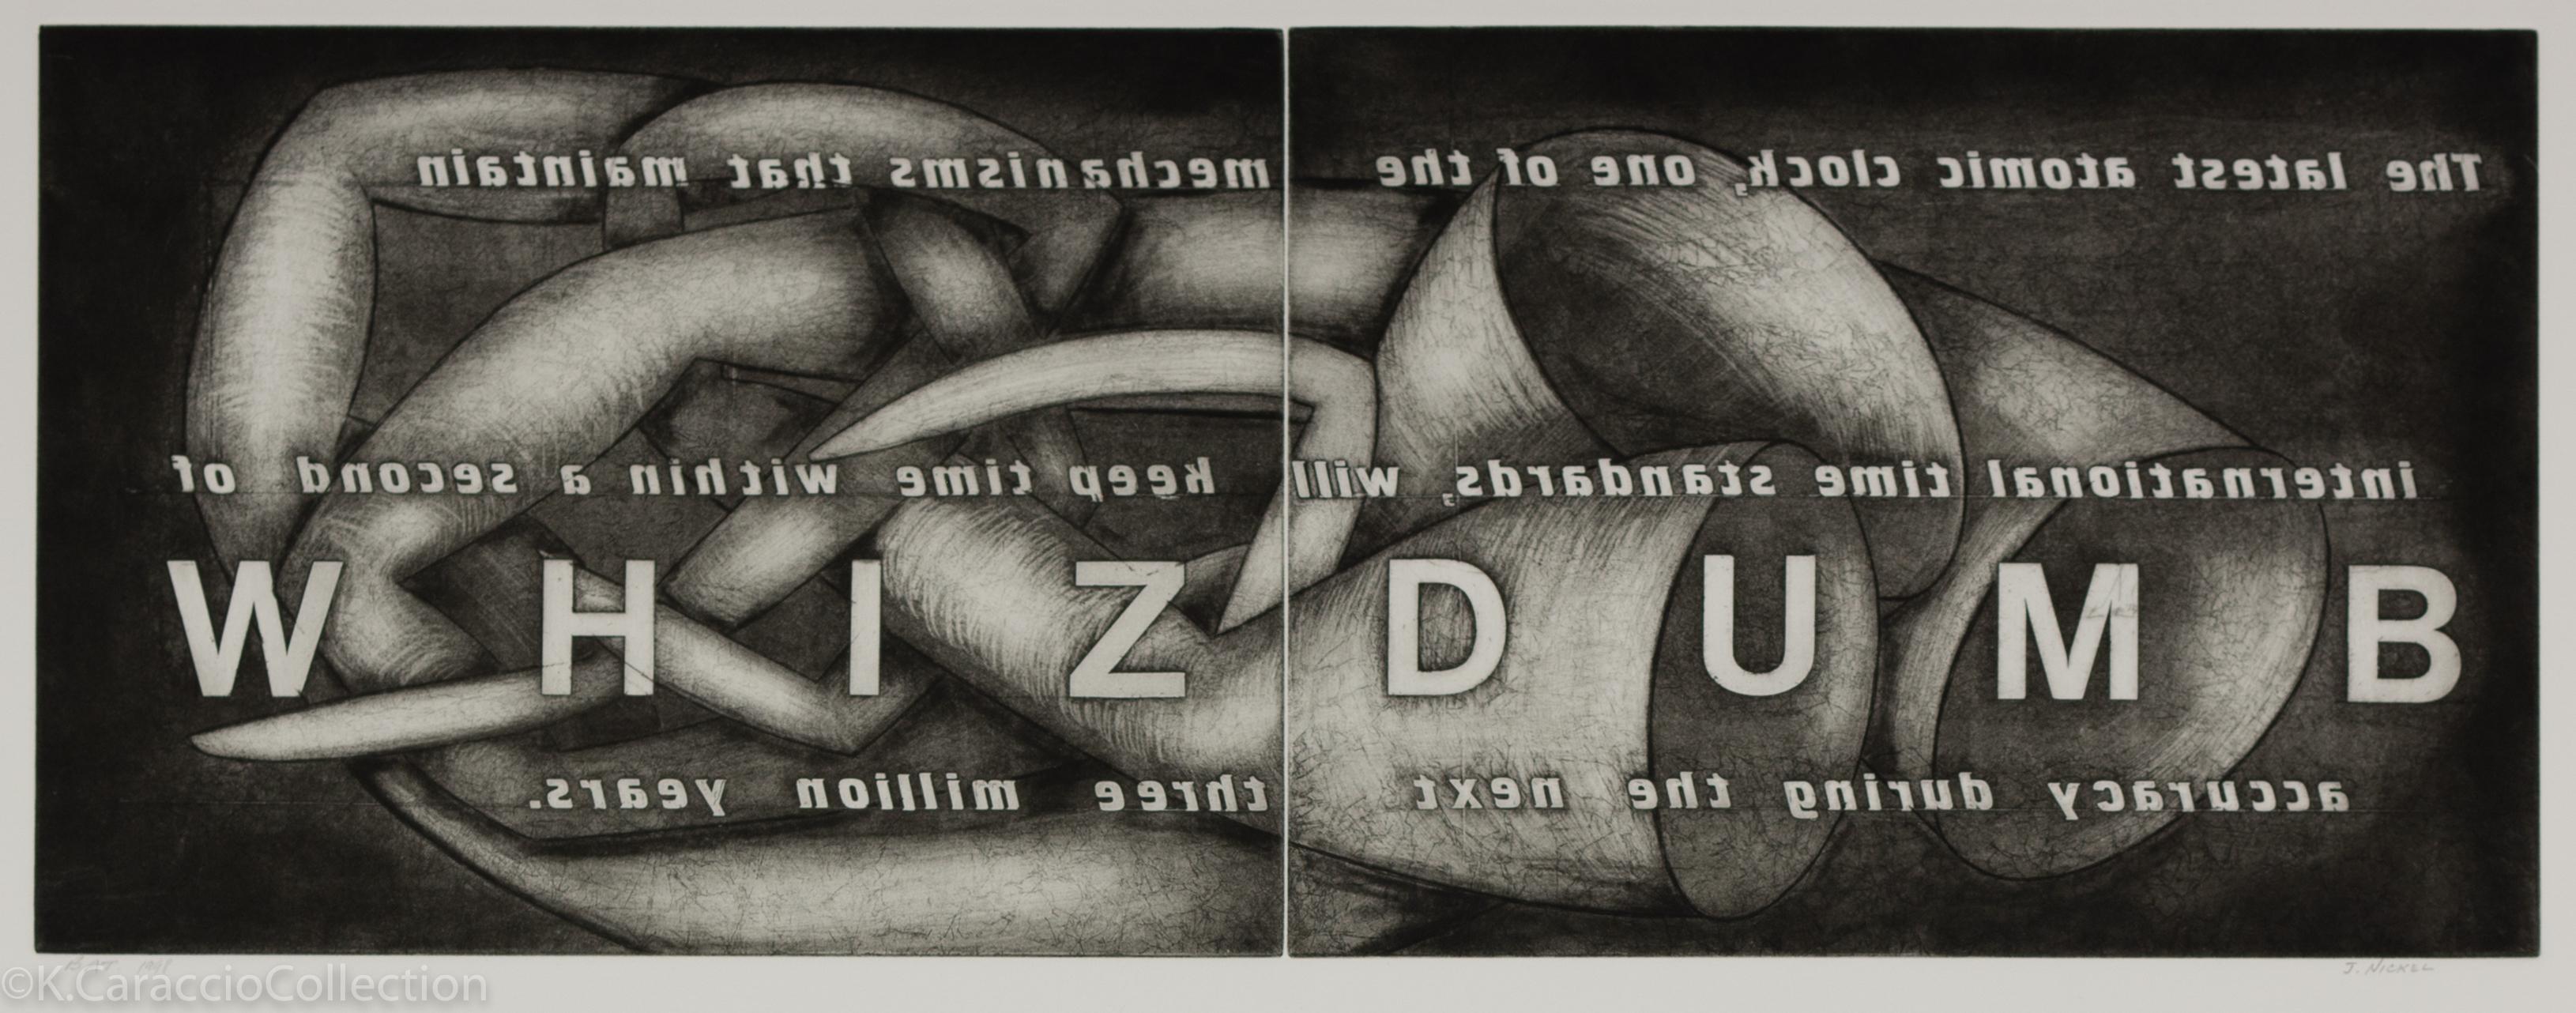 WHIZDUMB, 1998